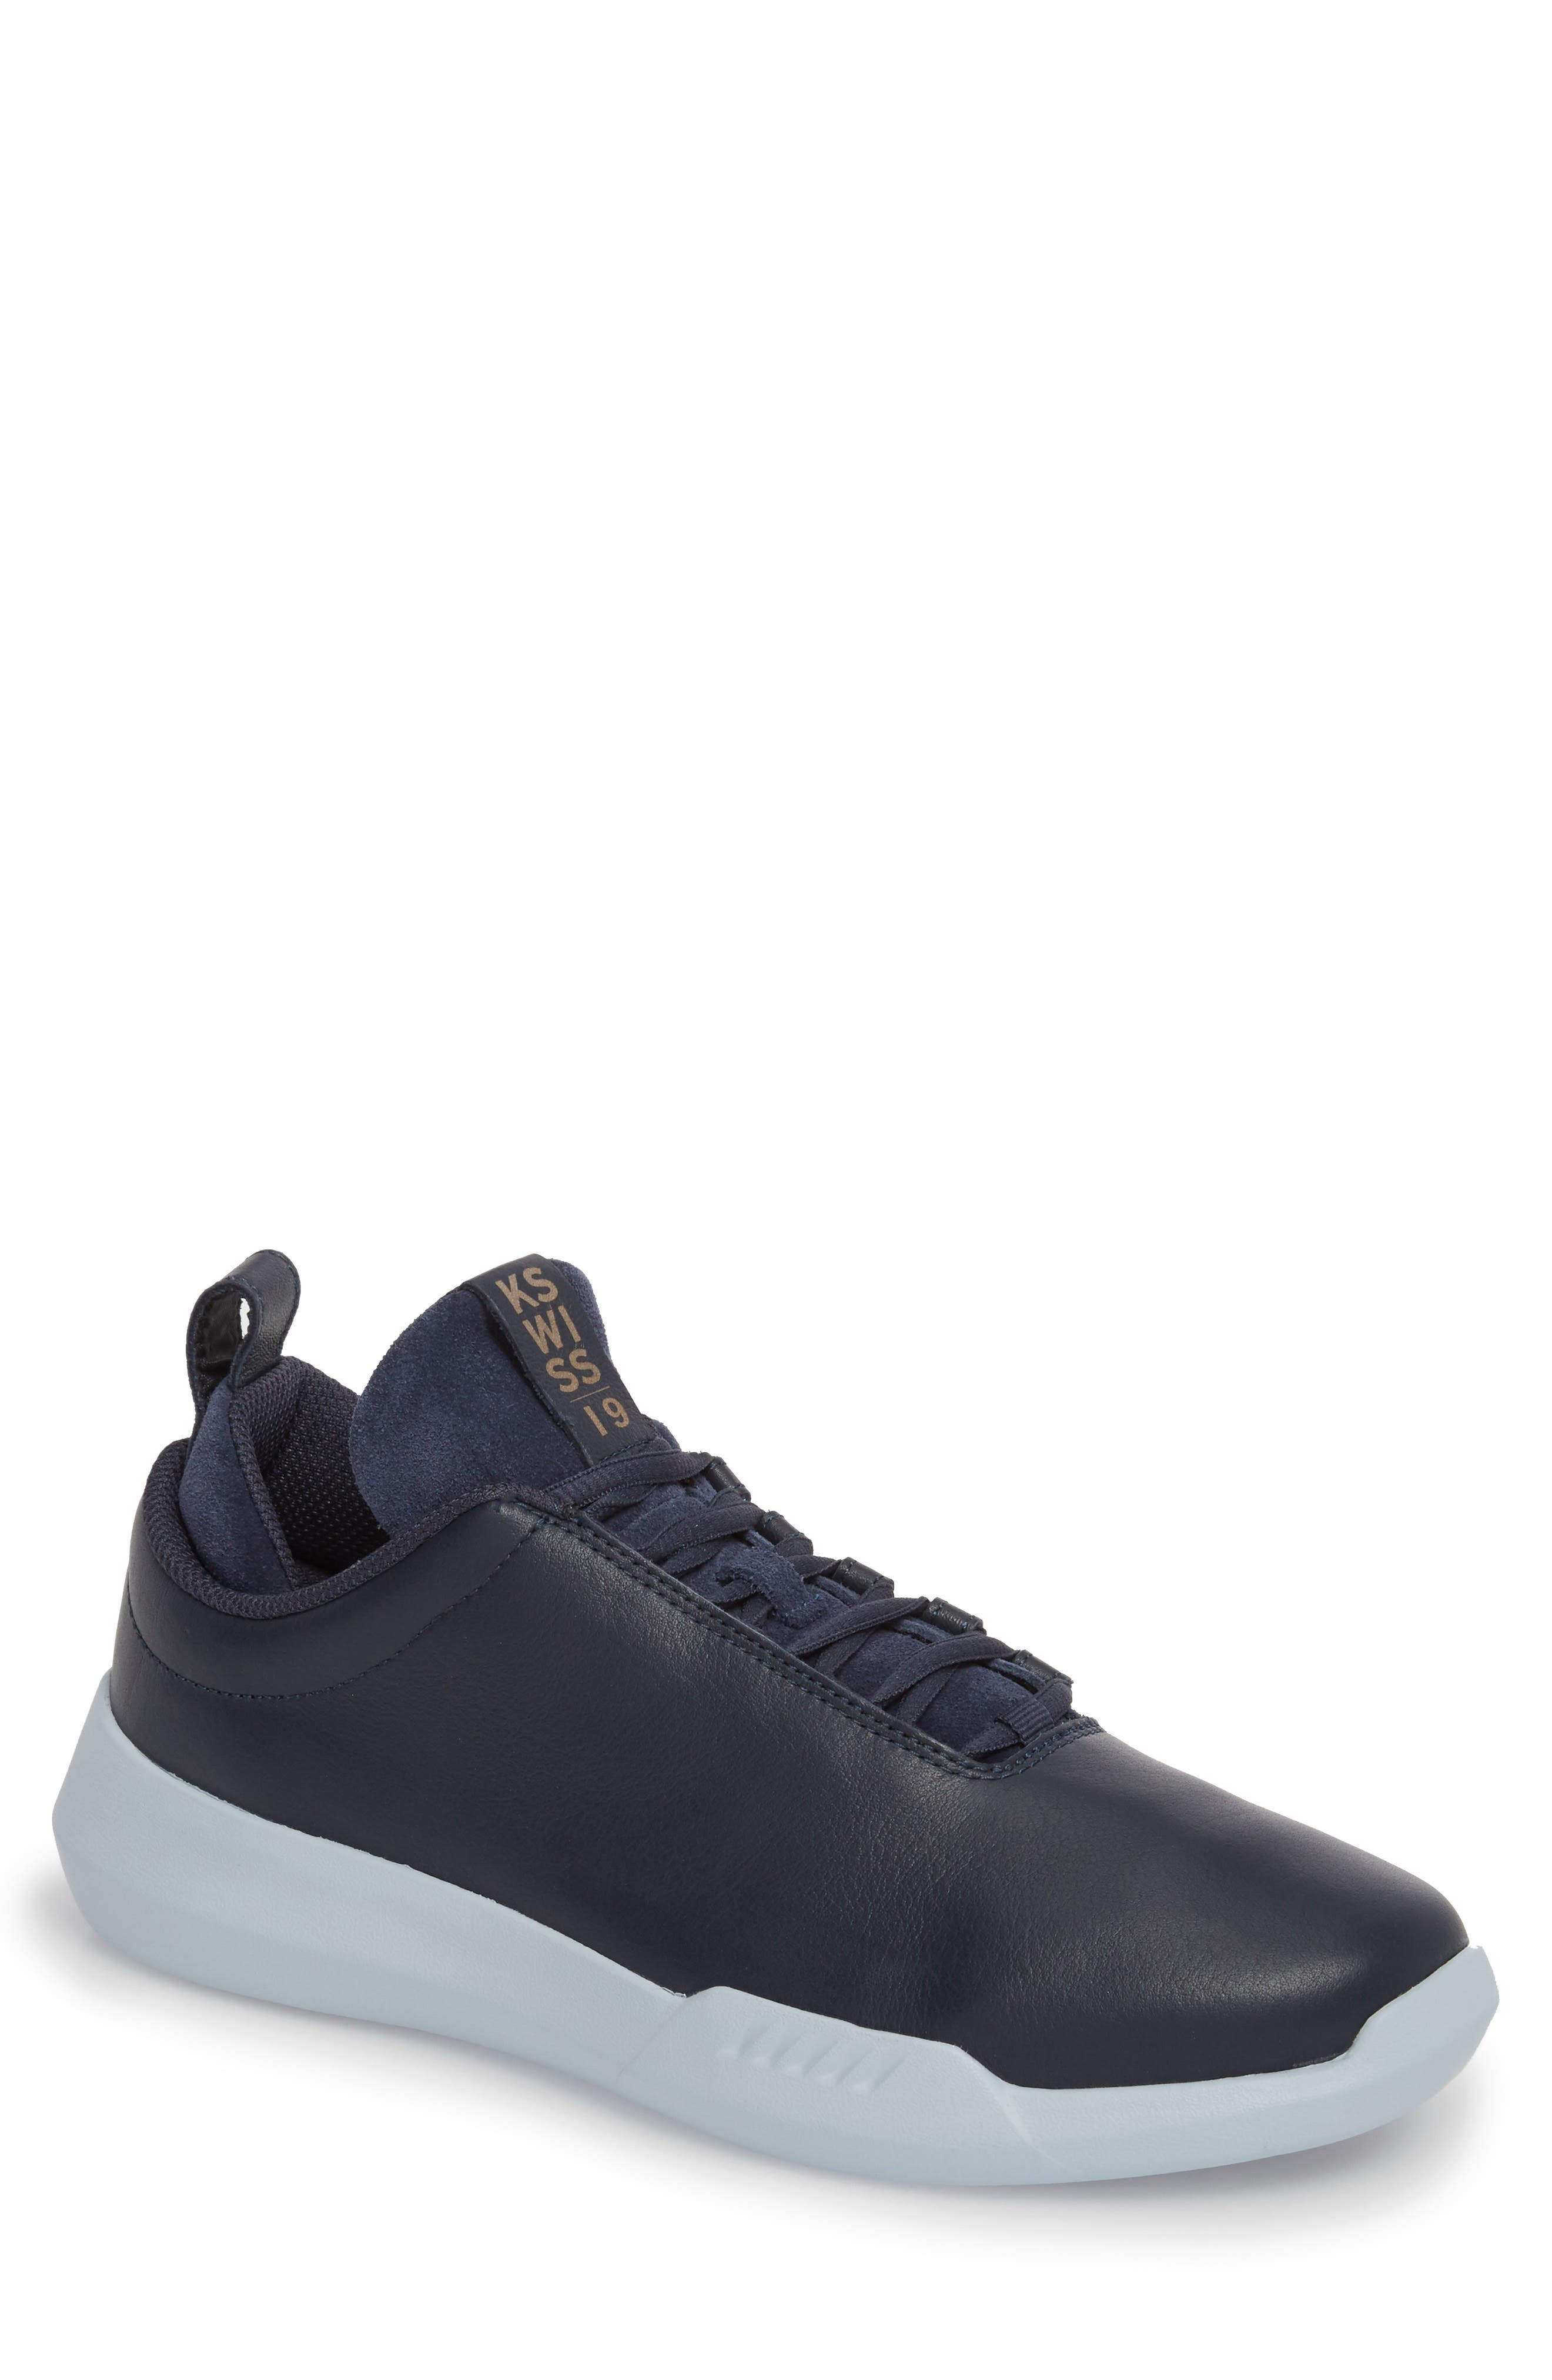 Gen-K Icon Sneaker,                             Main thumbnail 1, color,                             NAVY/CELESTIAL BLUE